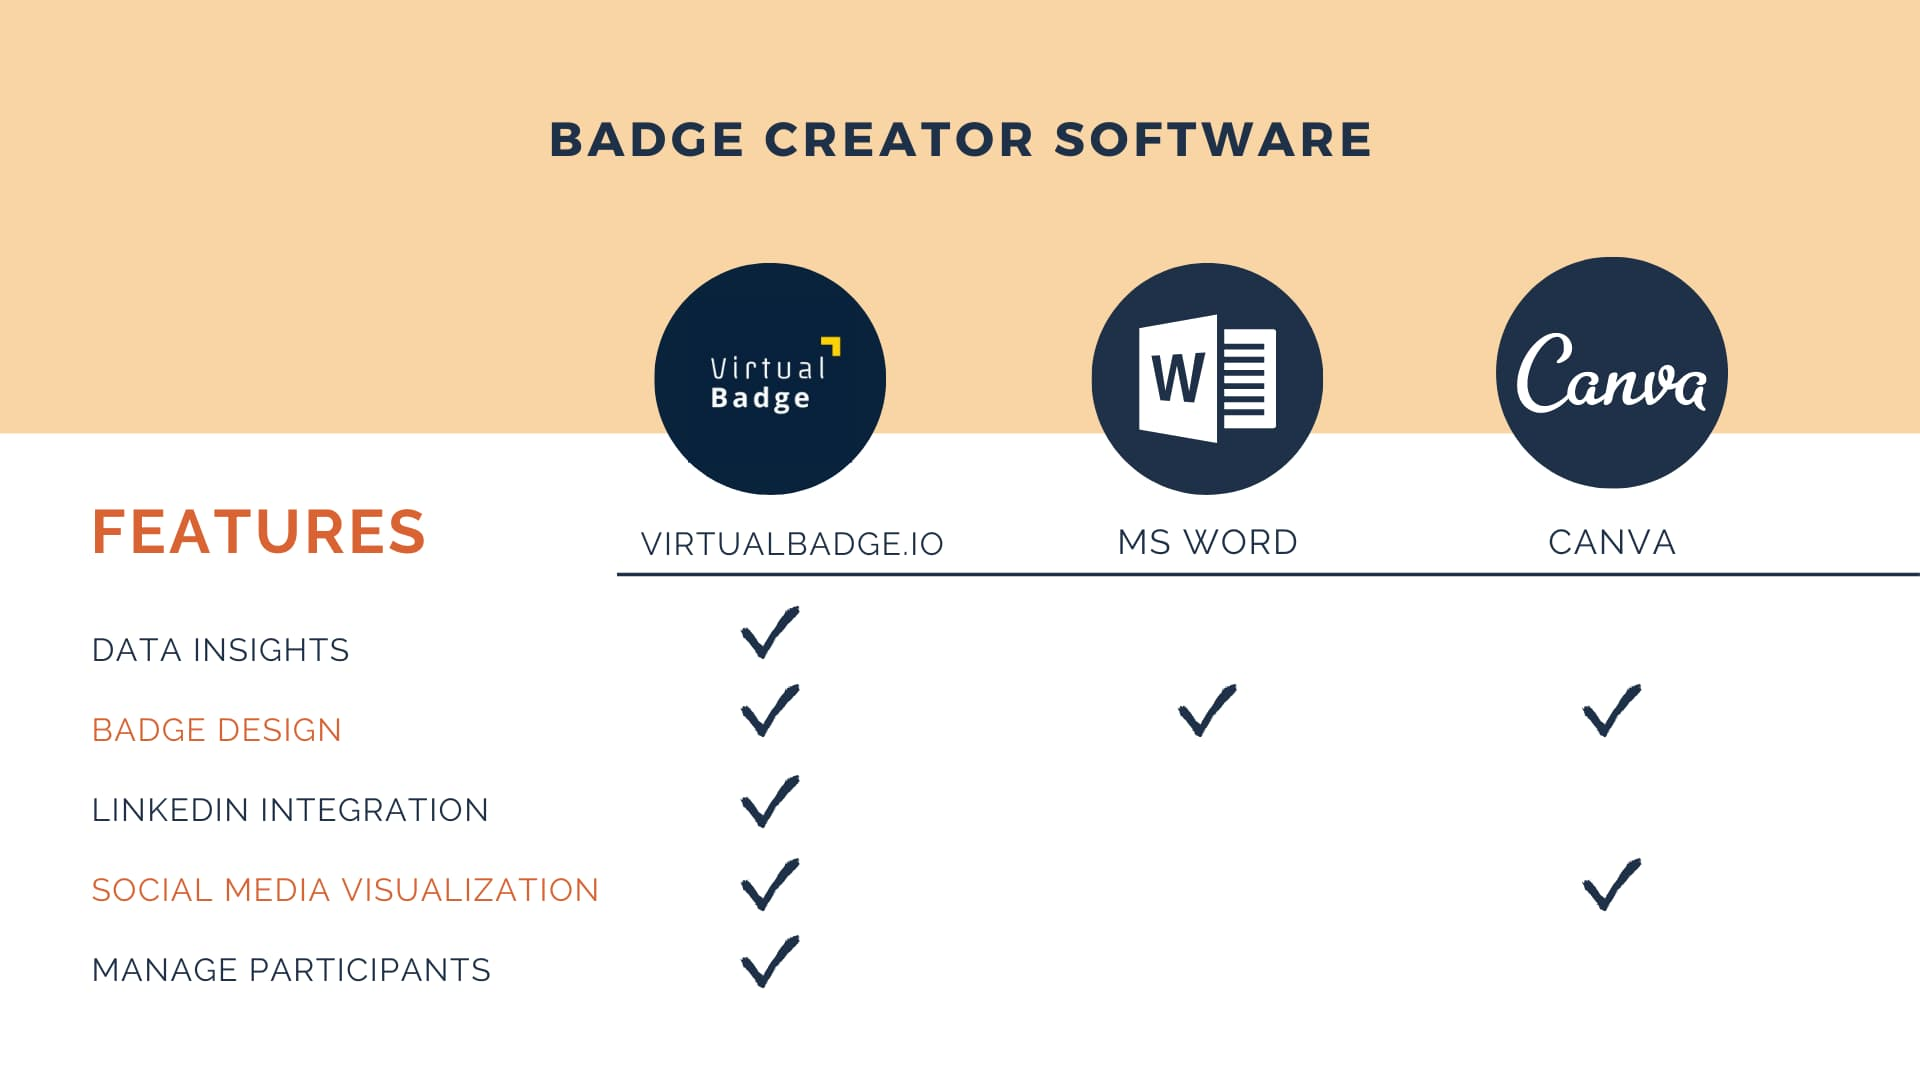 badge creator software: virtualbadge.io, ms word and canva to create digital badges